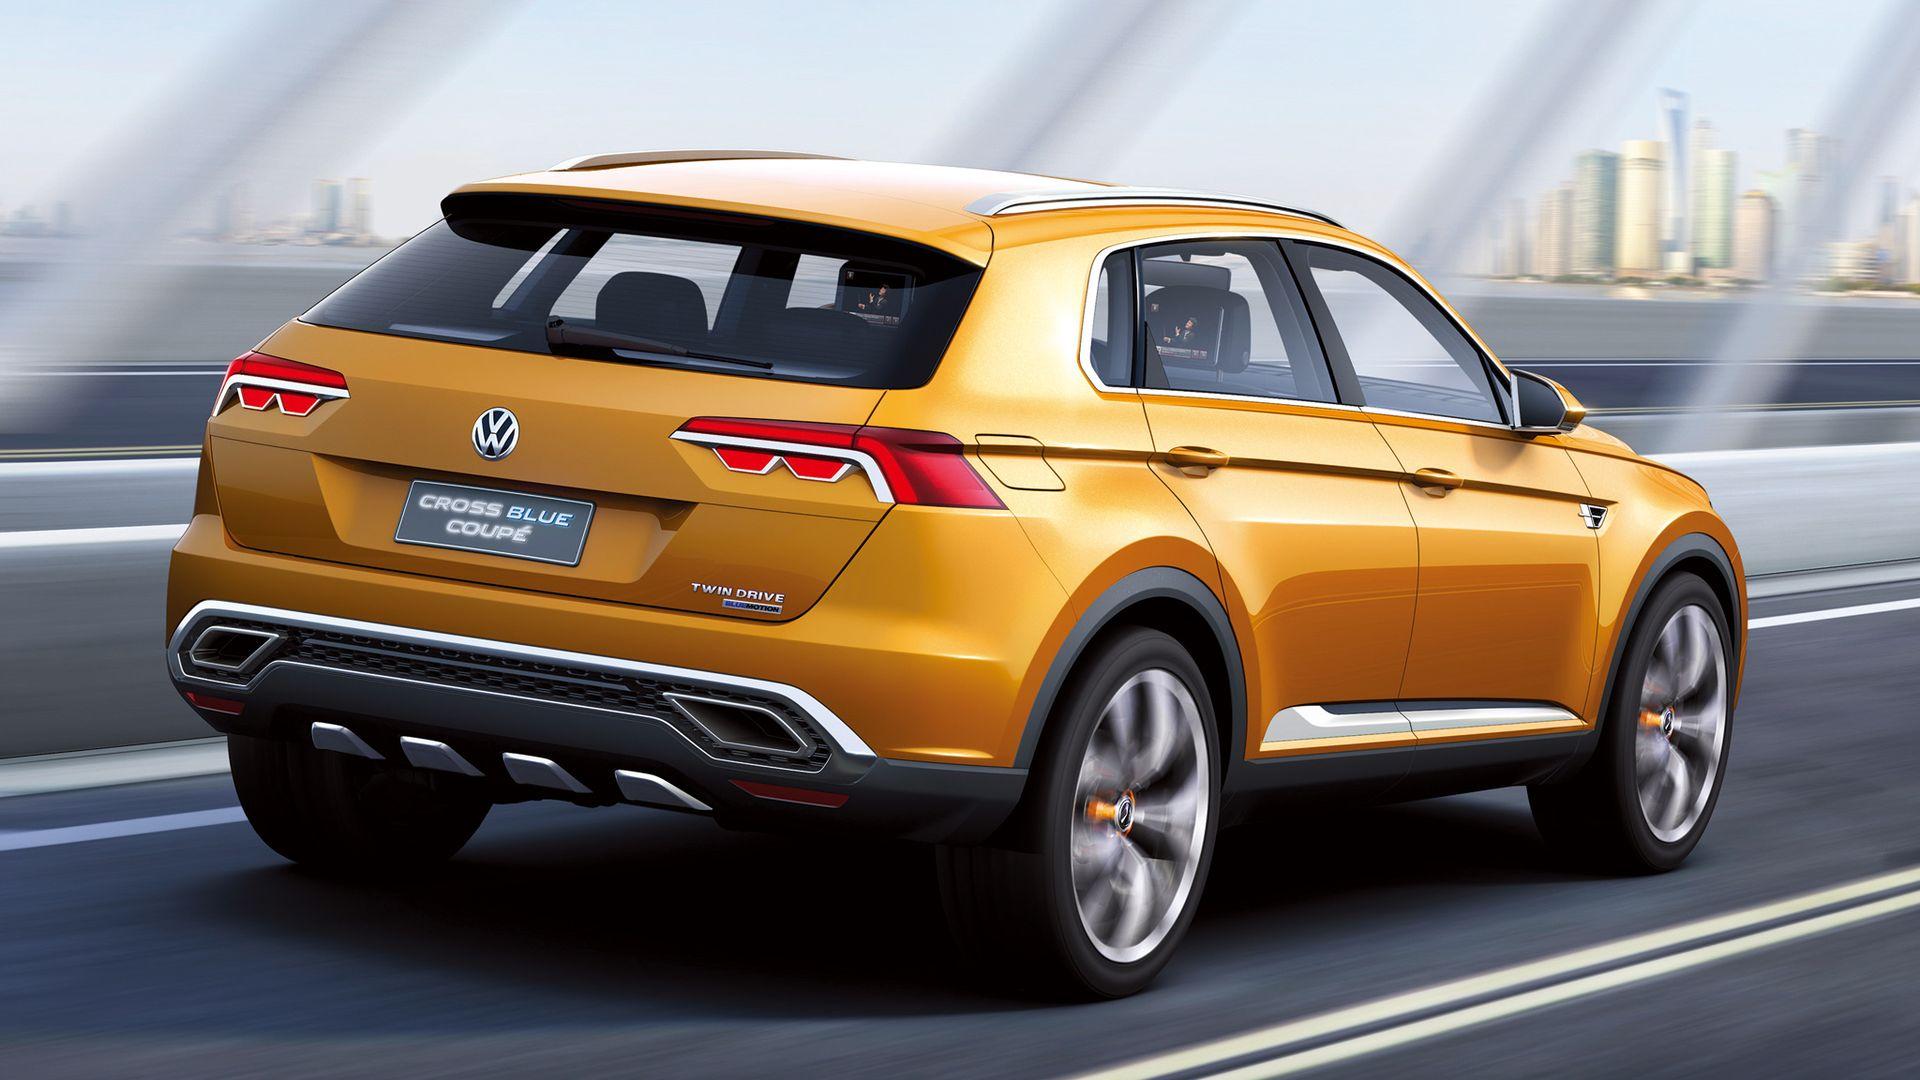 VW Crossblue coupe Con 2